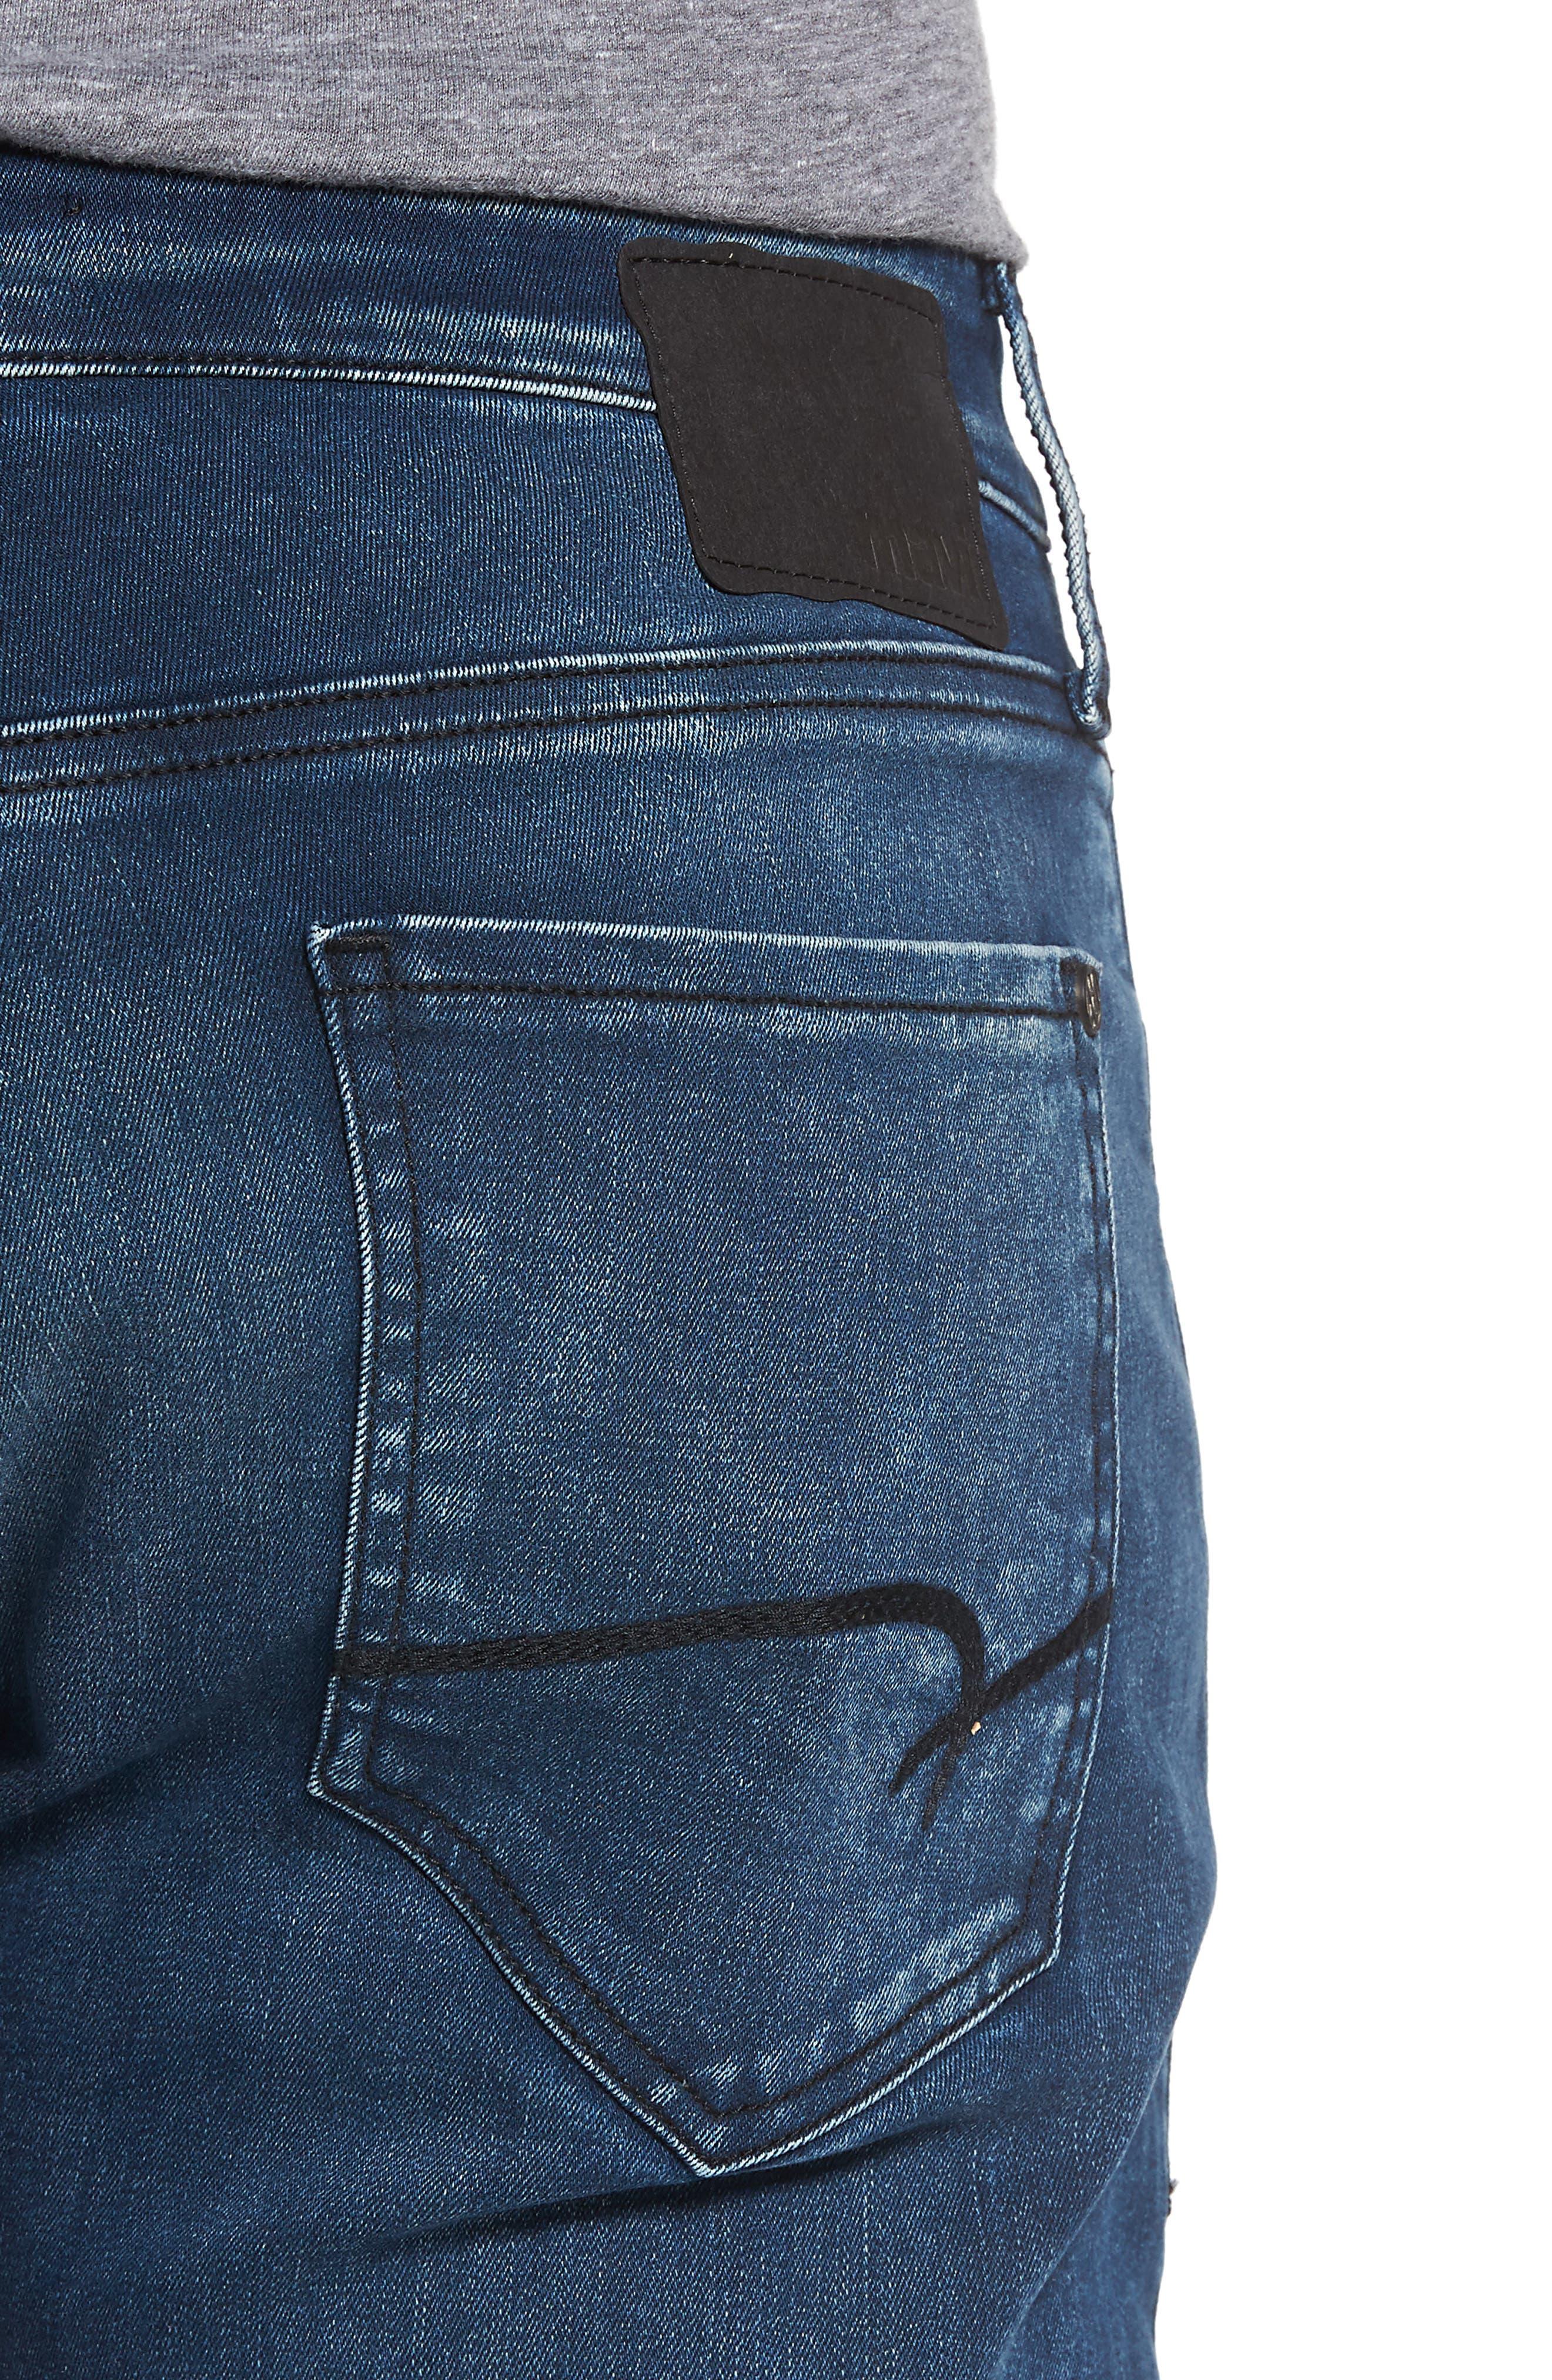 Marcus Slim Straight Leg Jeans,                             Alternate thumbnail 4, color,                             401